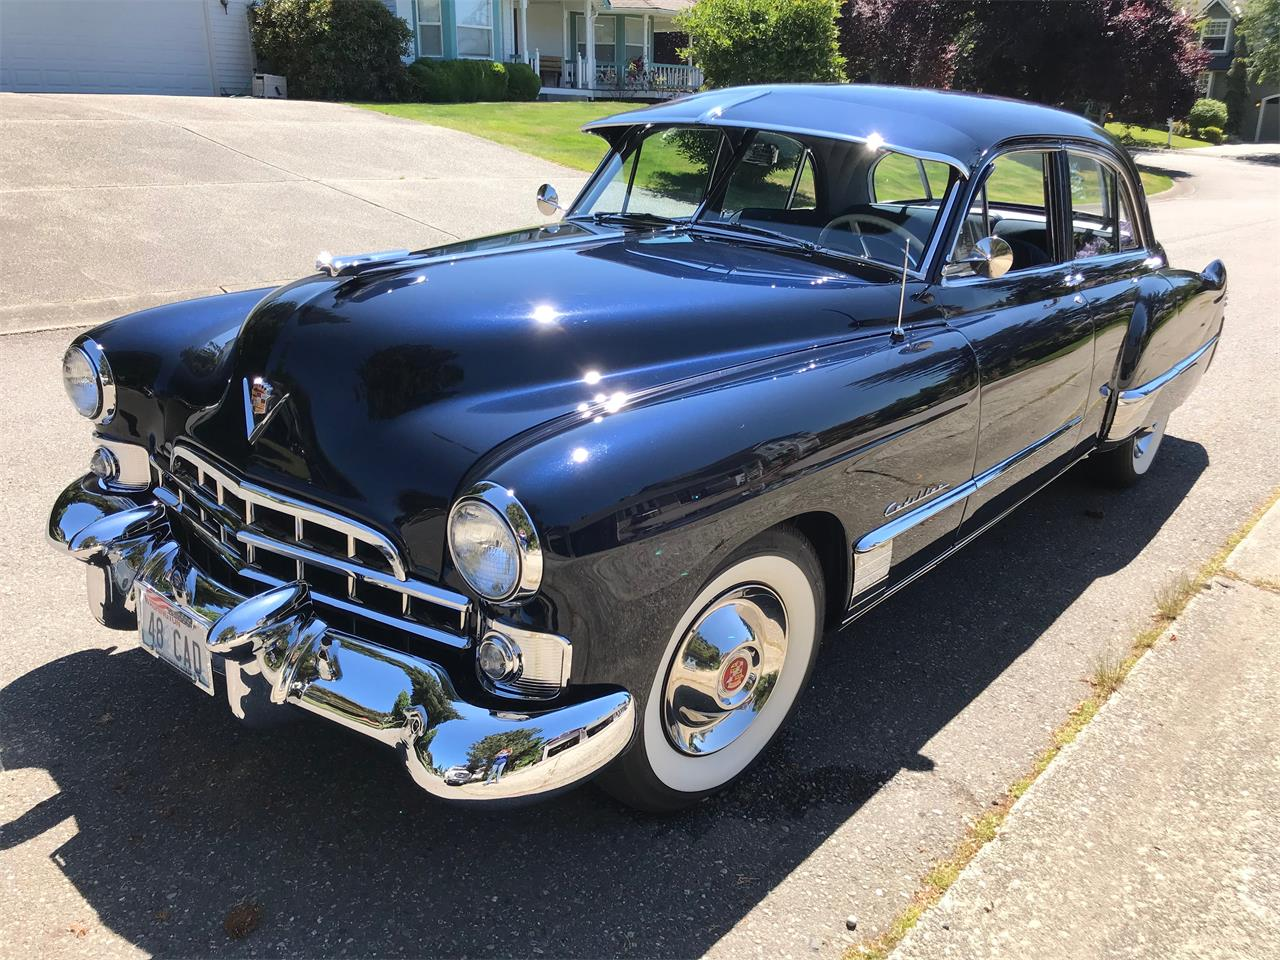 For Sale: 1948 Cadillac 4-Dr Sedan in Duvall, Washington